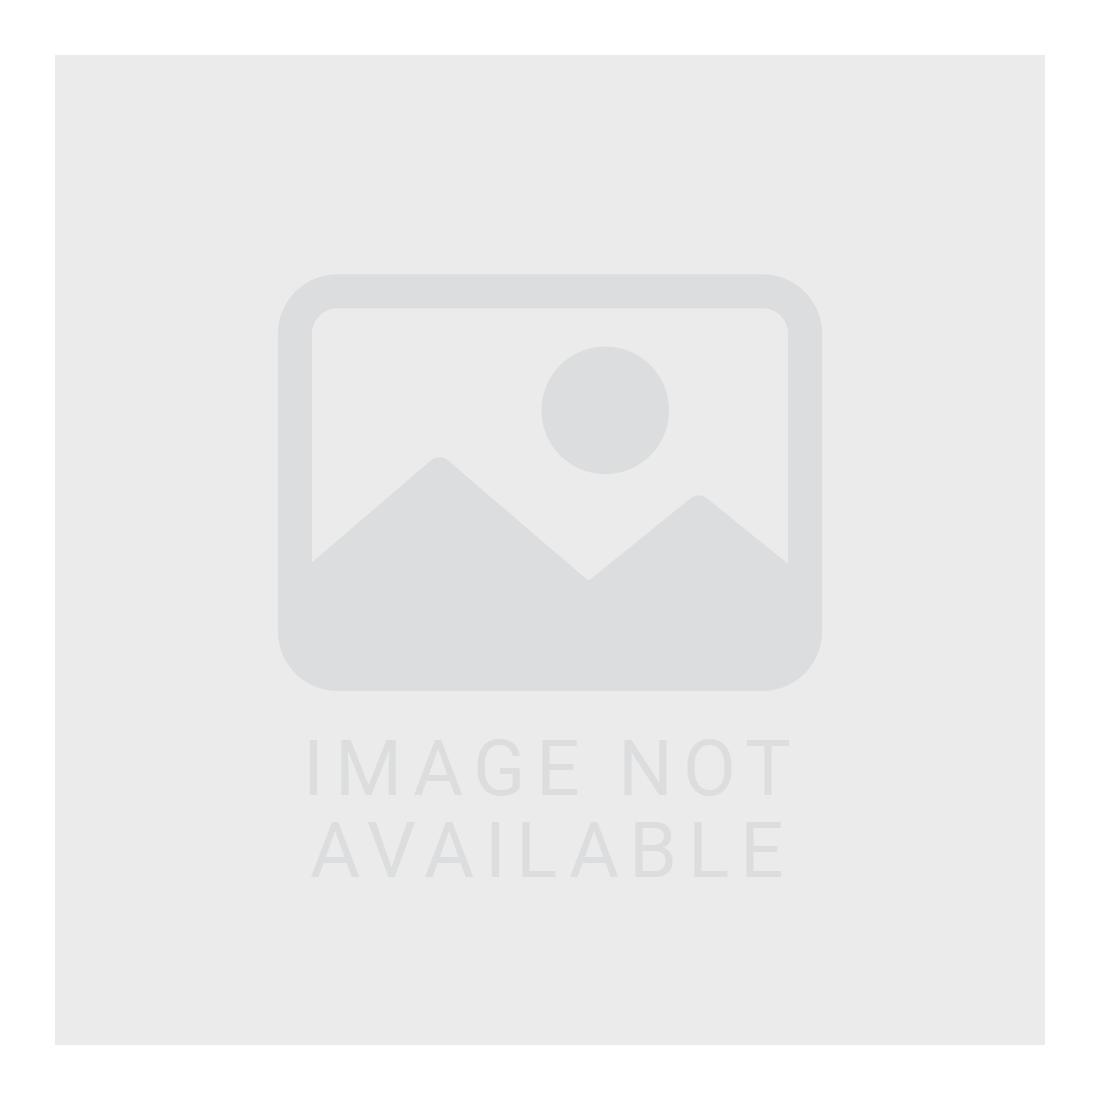 Stemless Wine Glass 2-Pack